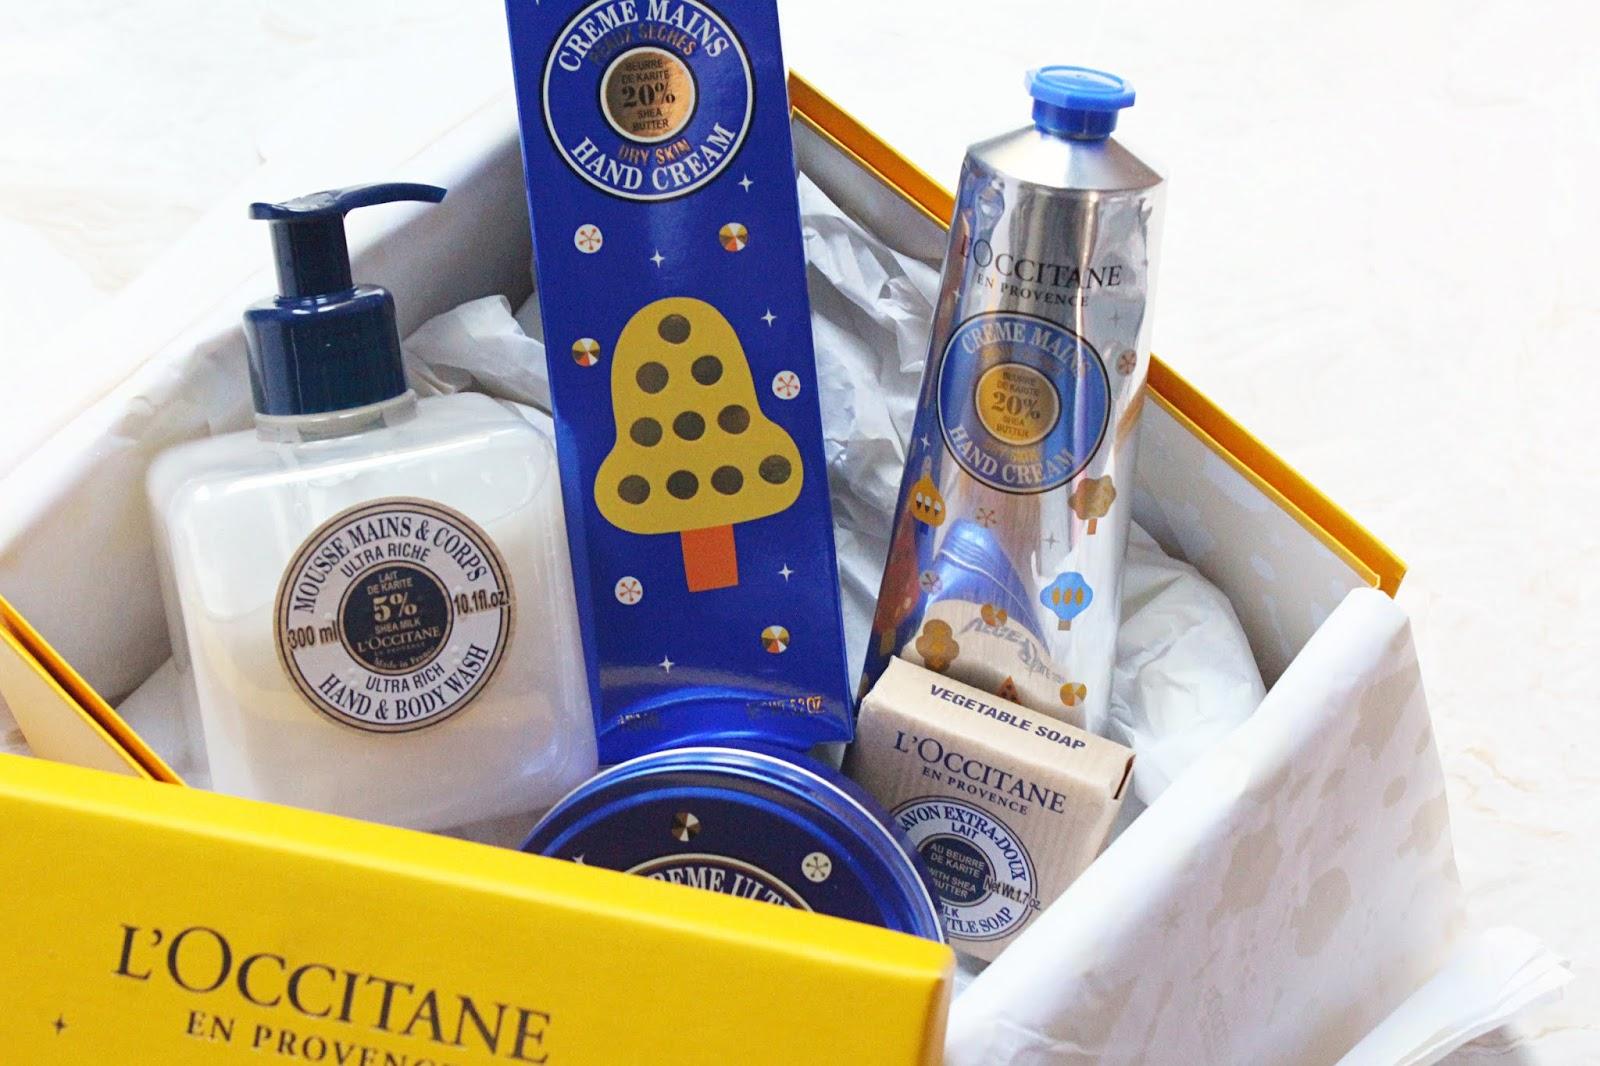 L'Occitane Nourishing Shea Butter Collection